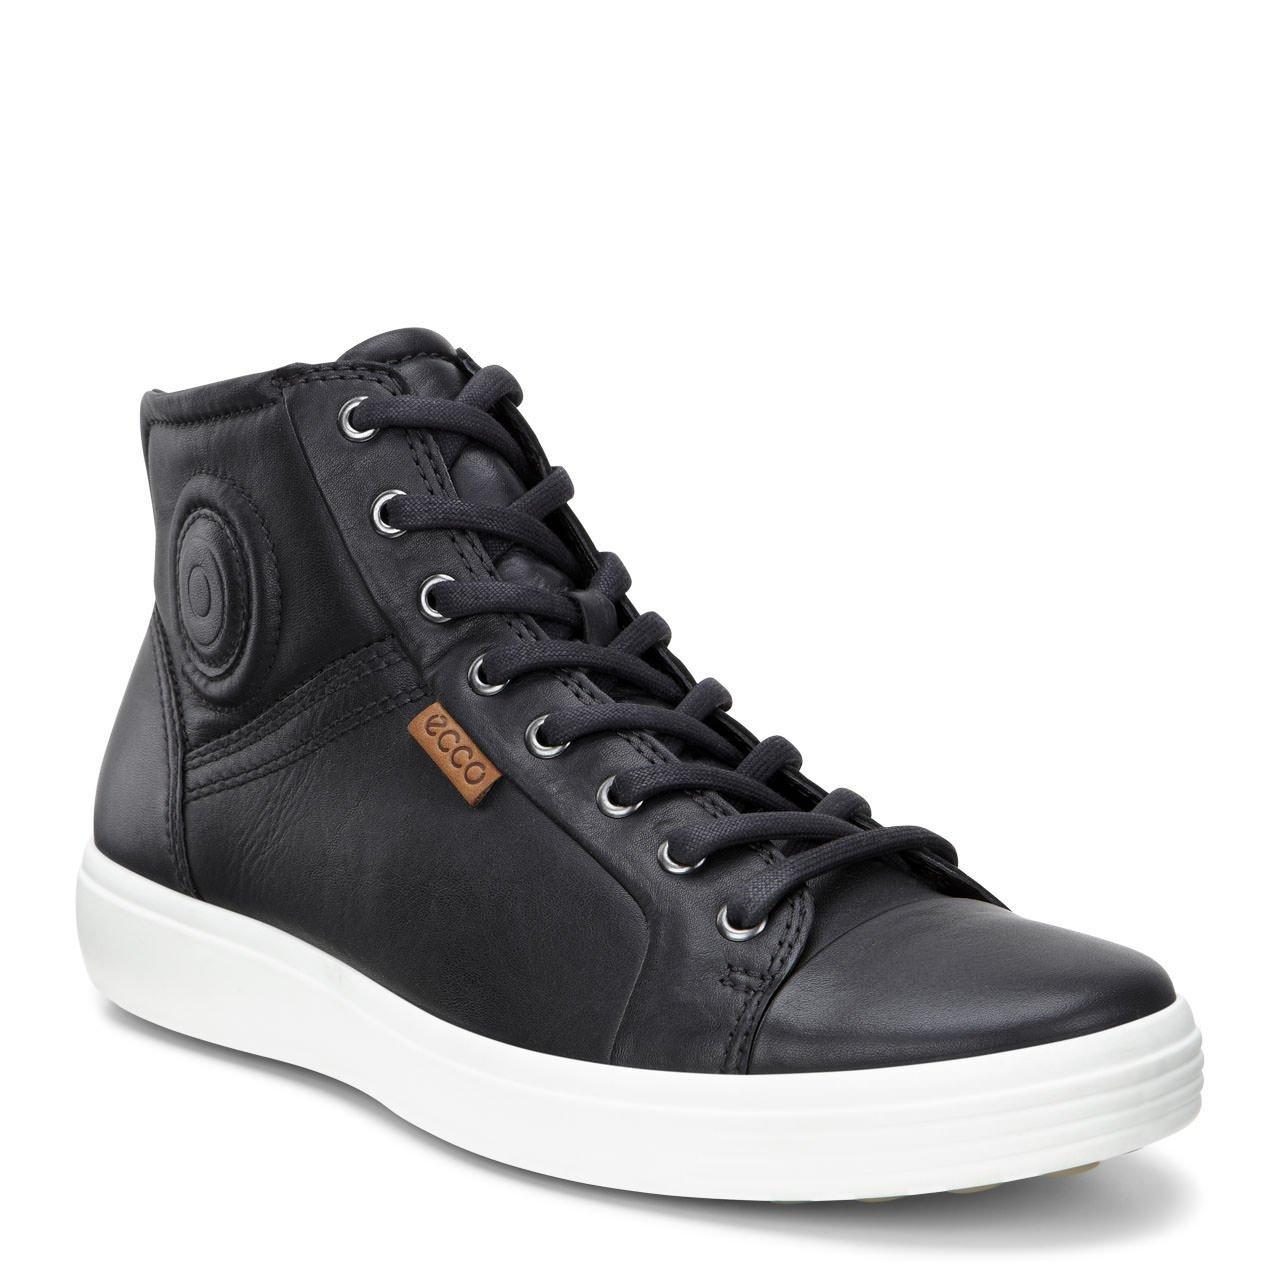 Herren ECCO Sneaker Günstig Online Kaufen, ECCO SOFT 7 M